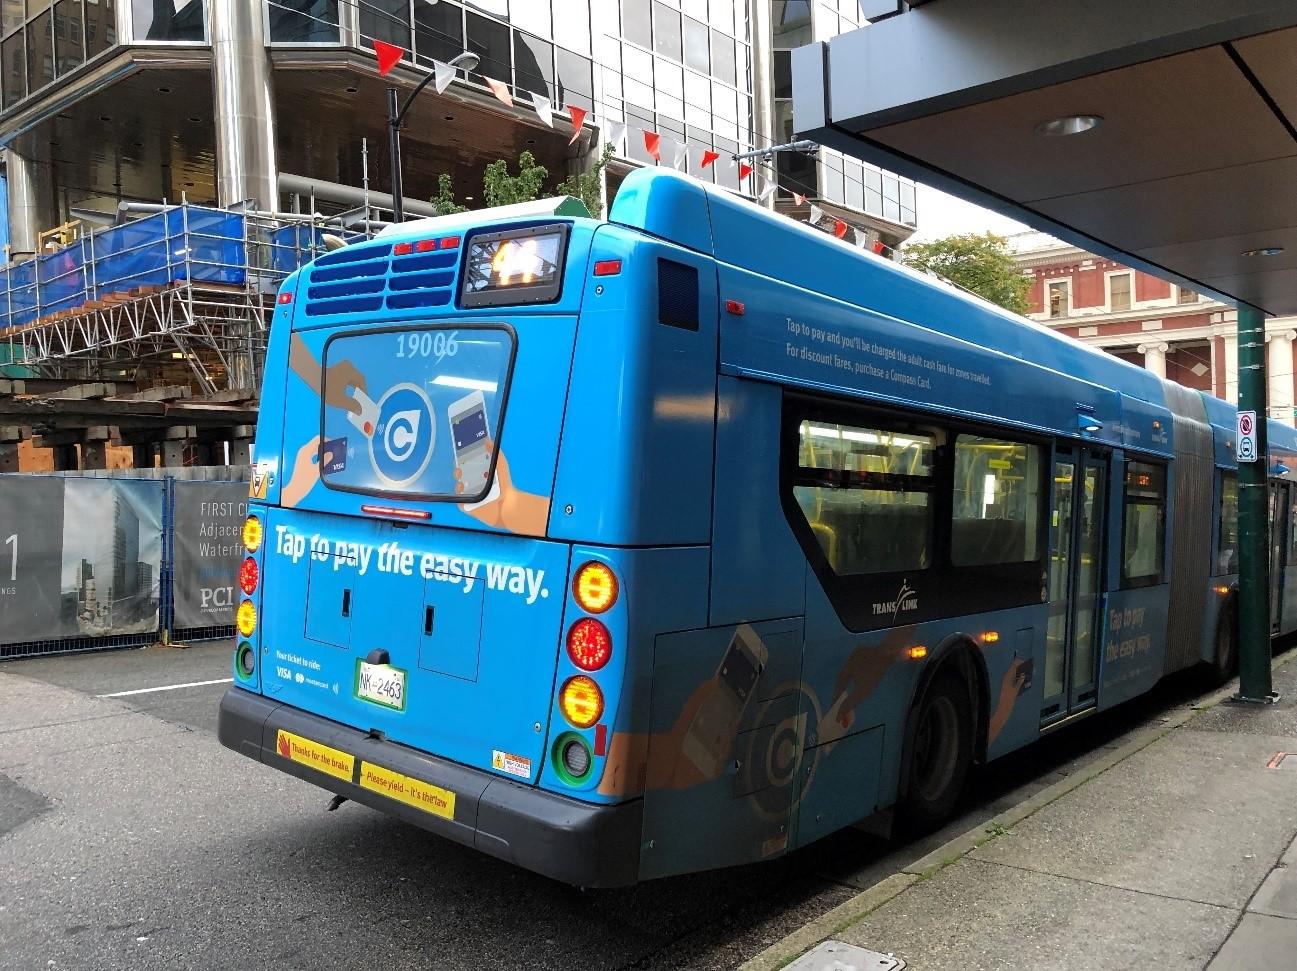 SecureSketCH_クレジットカードを使って乗車できることをアピールするデザインのバス